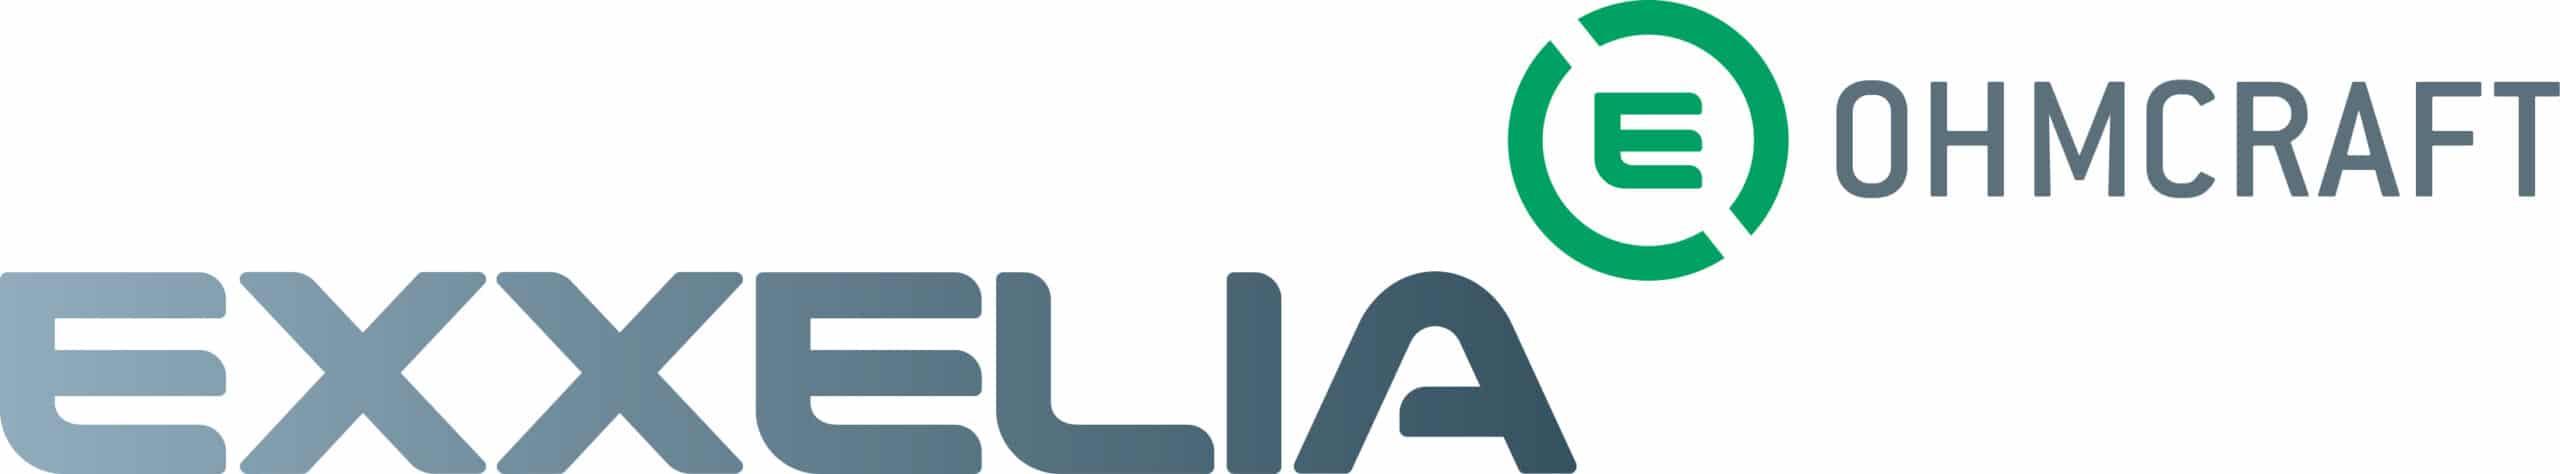 Exxelia Ohmcraft Company Logo 2020